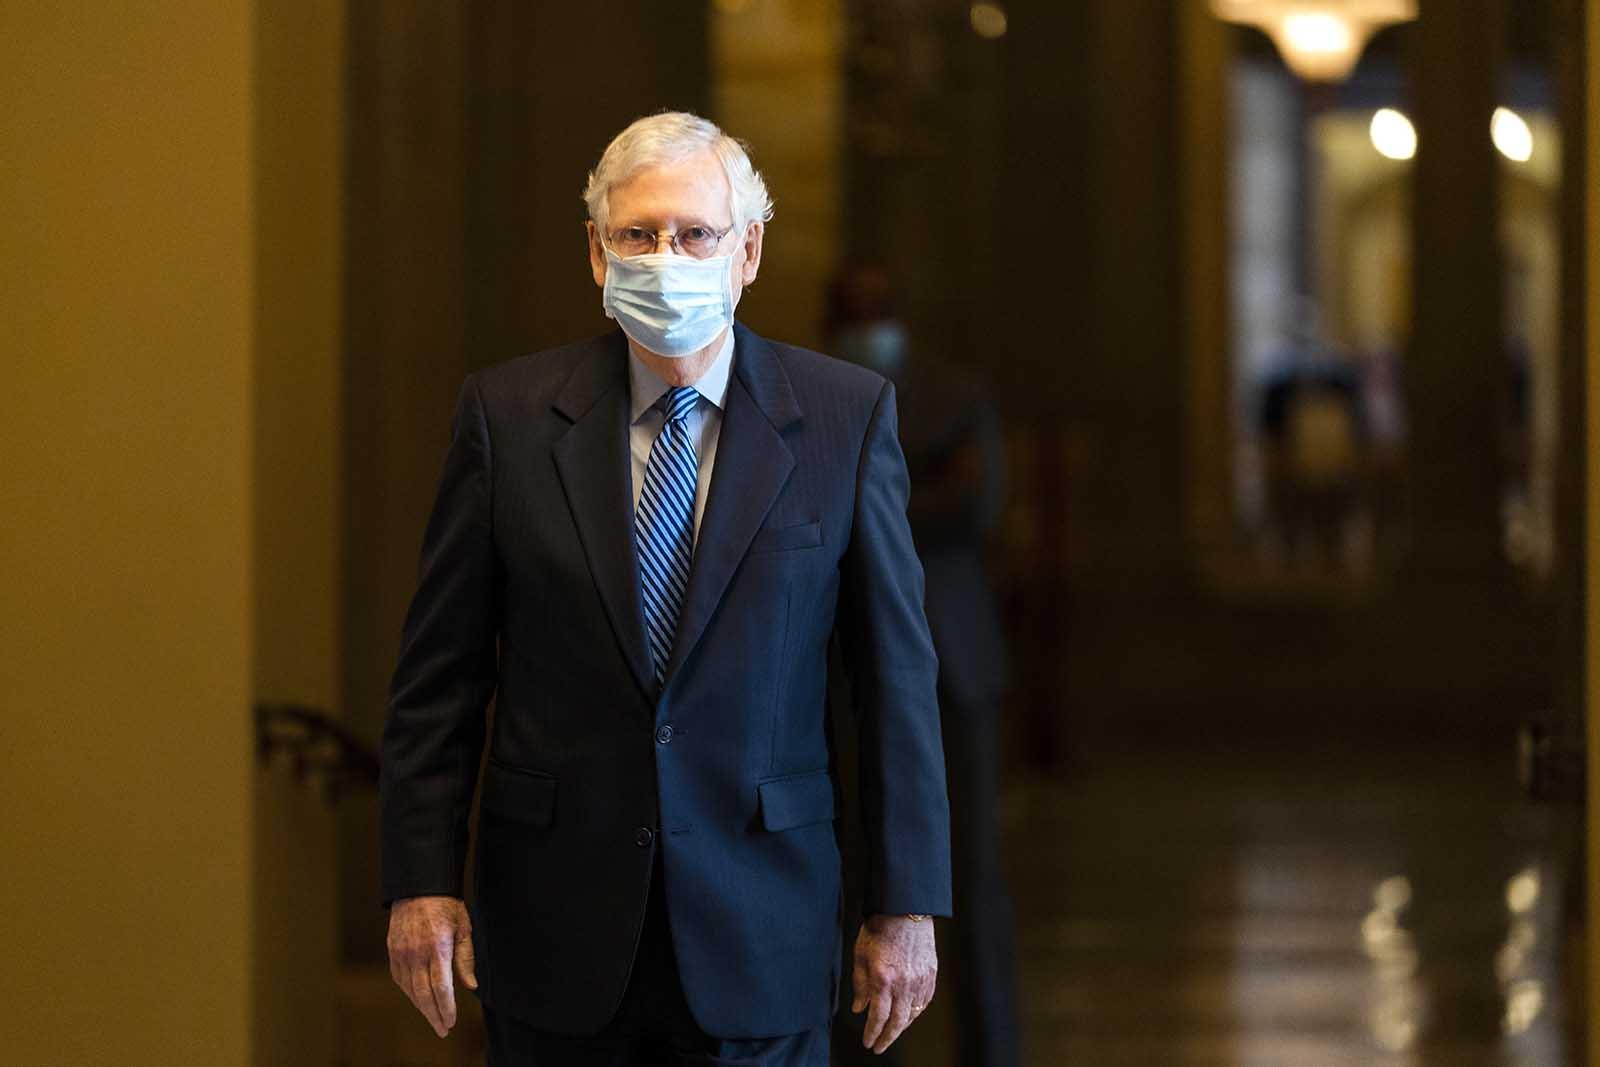 Senate Majority Leader Sen. Mitch McConnell walks towards the Senate floor on Capitol Hill on Thursday, Oct. 1, in Washington.